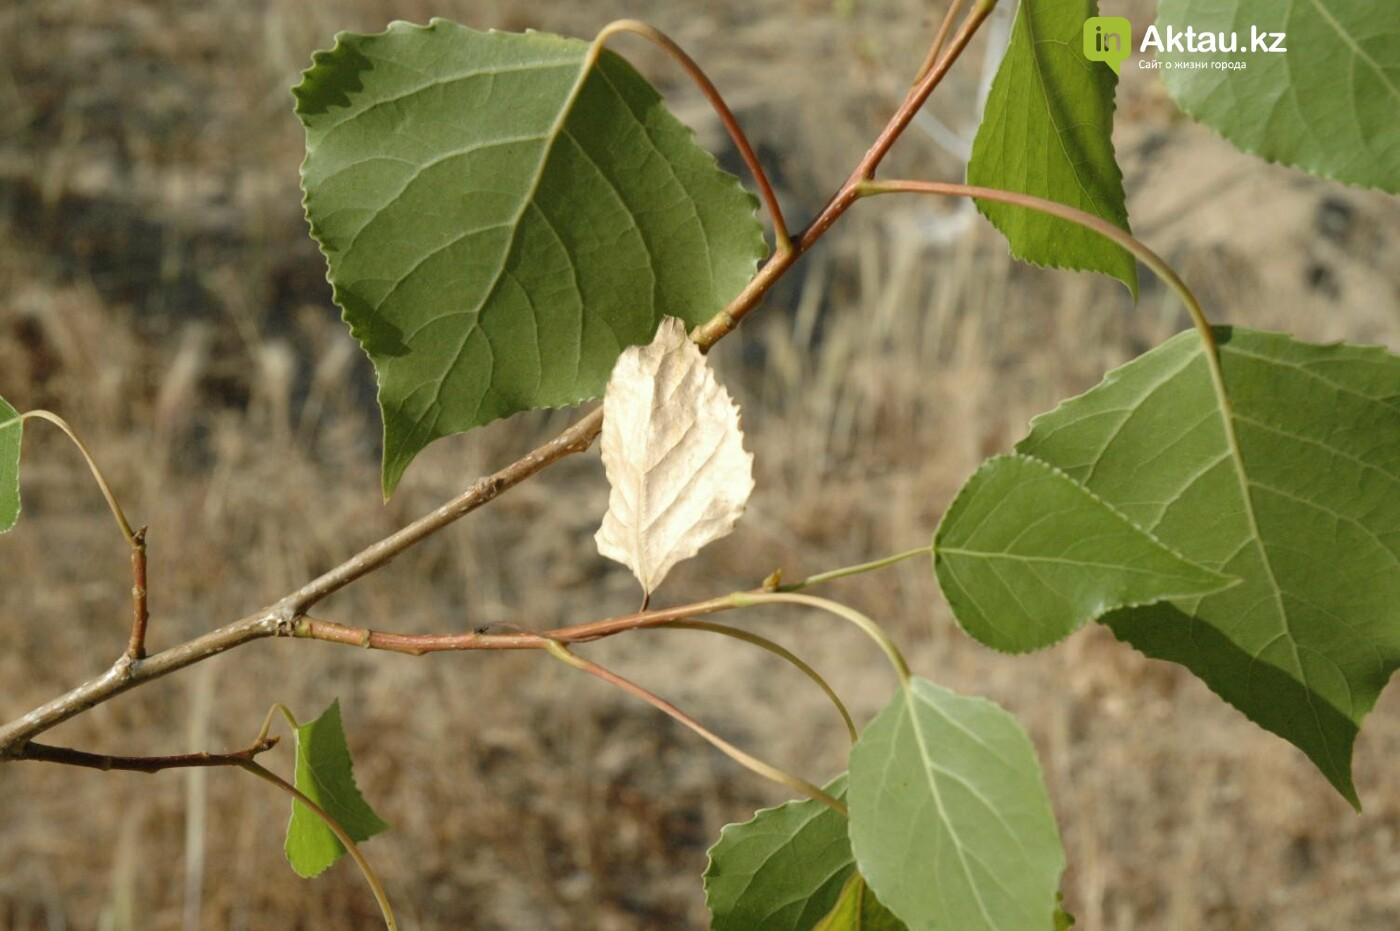 Погибшие от засухи и обезвоживания в Актау исчисляются десятками (ФОТО), фото-15